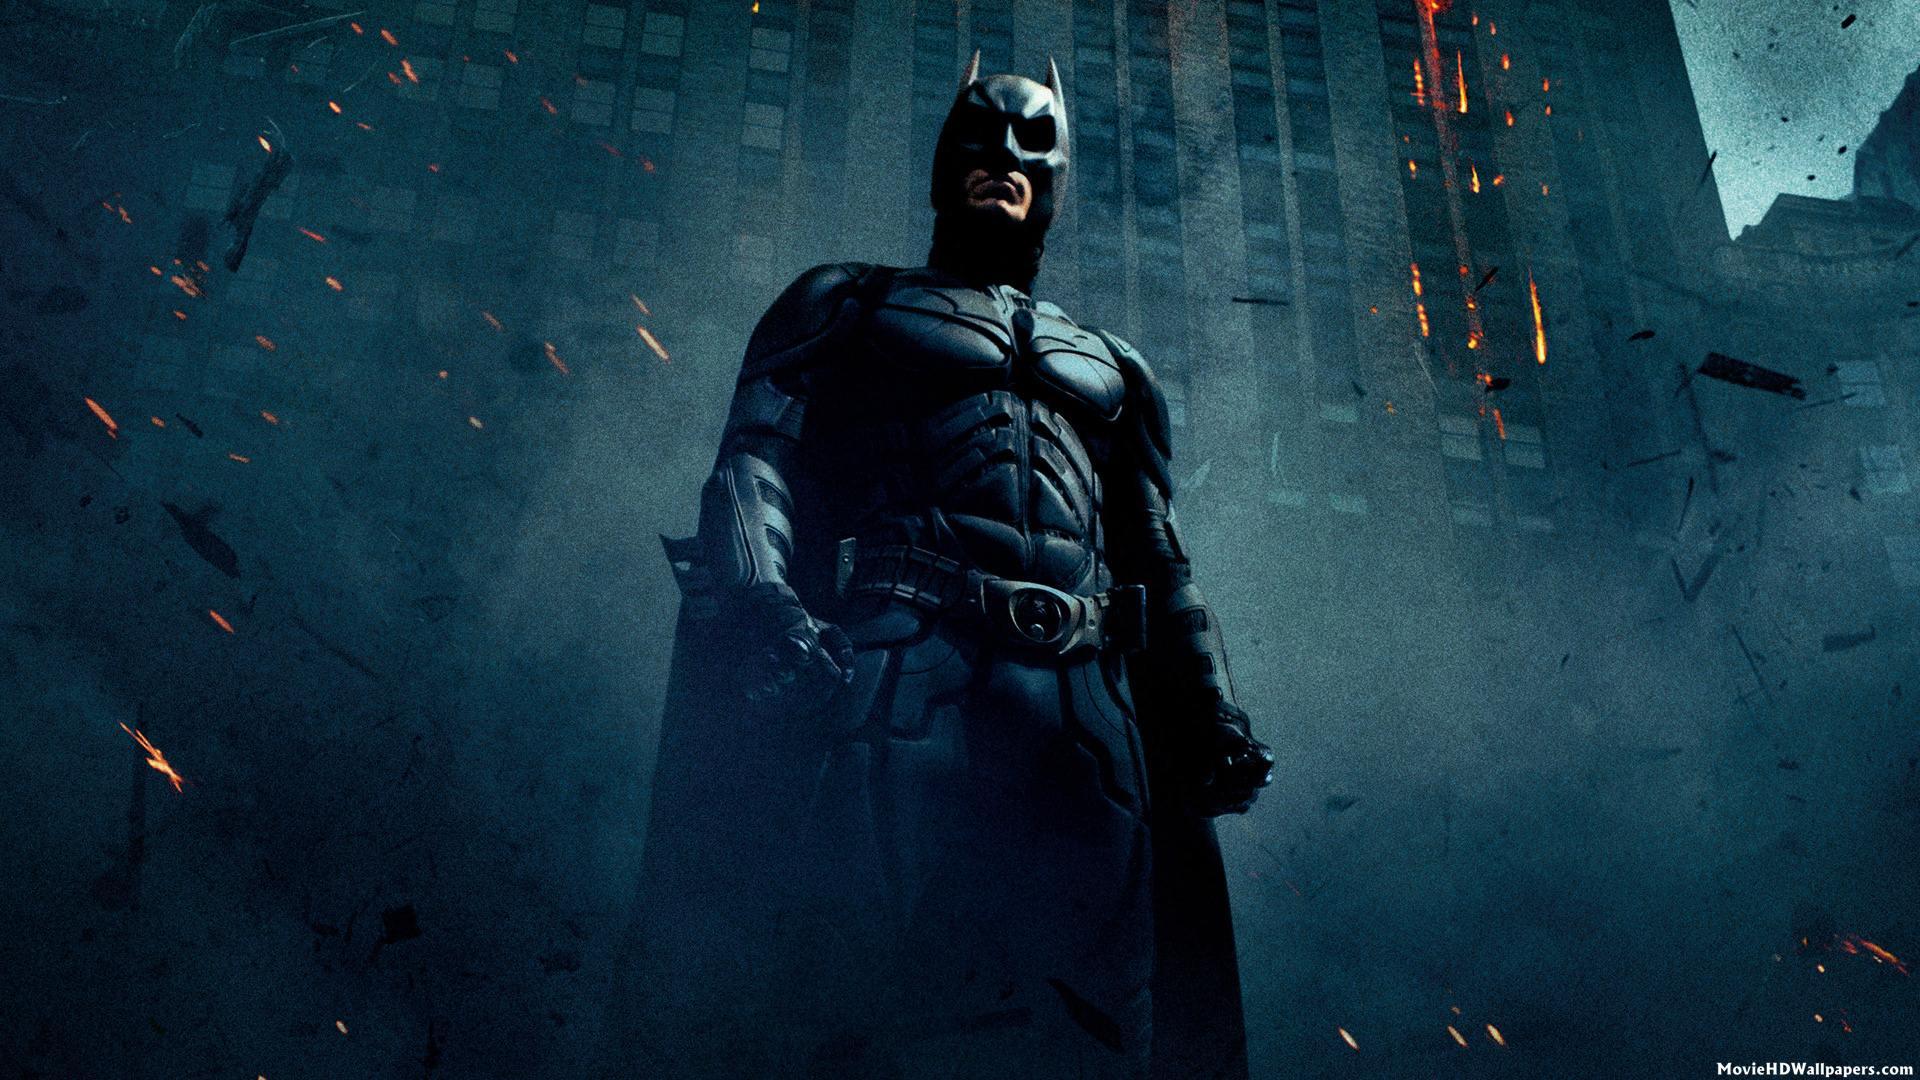 Batman The Dark Knight Wallpapers Top Free Batman The Dark Knight Backgrounds Wallpaperaccess